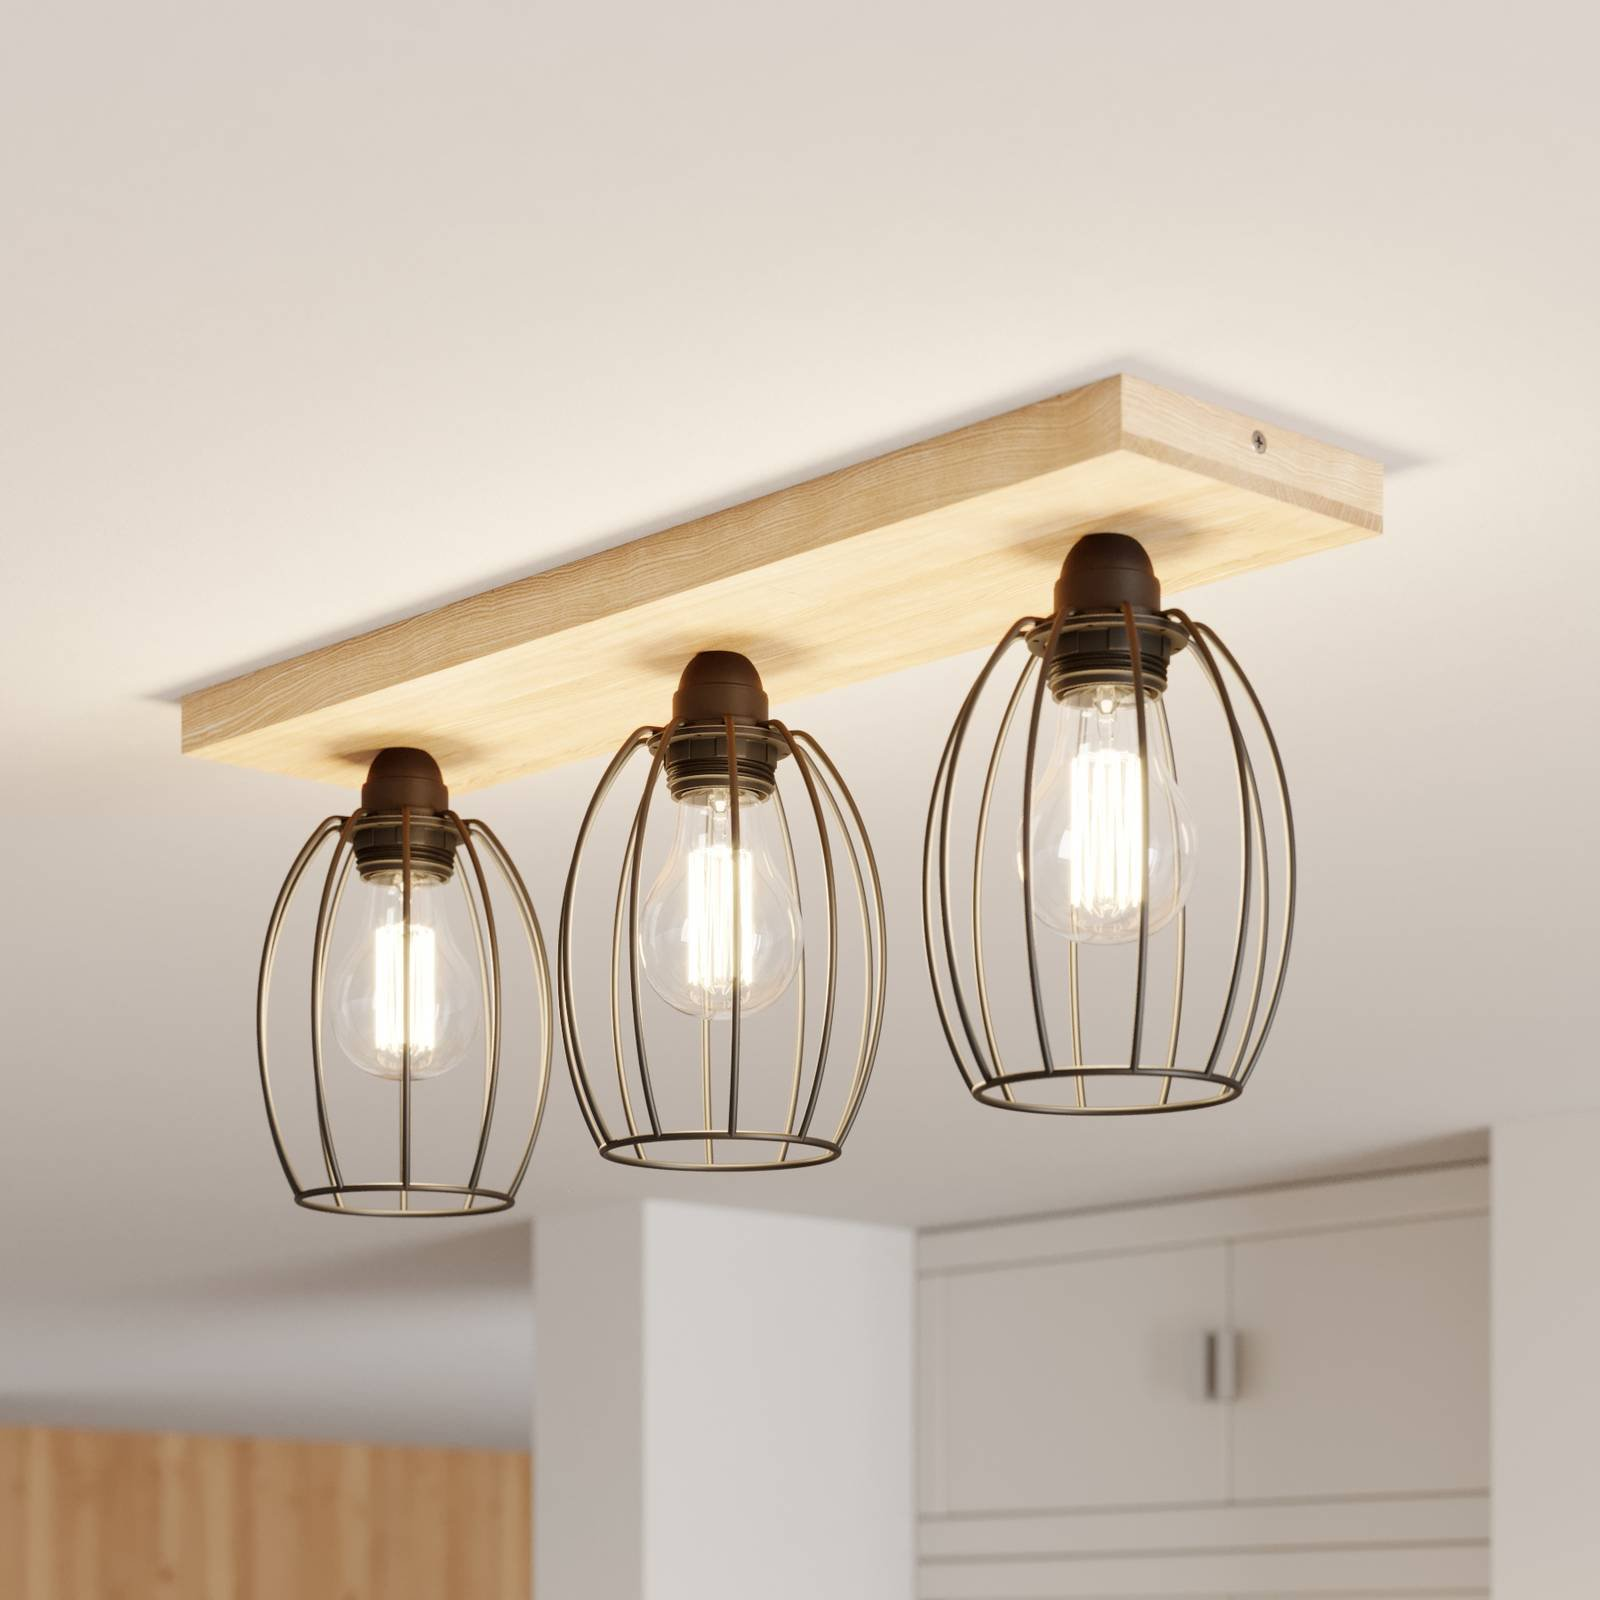 Taklampe Beevly, tre og metall, 3 lyskilder